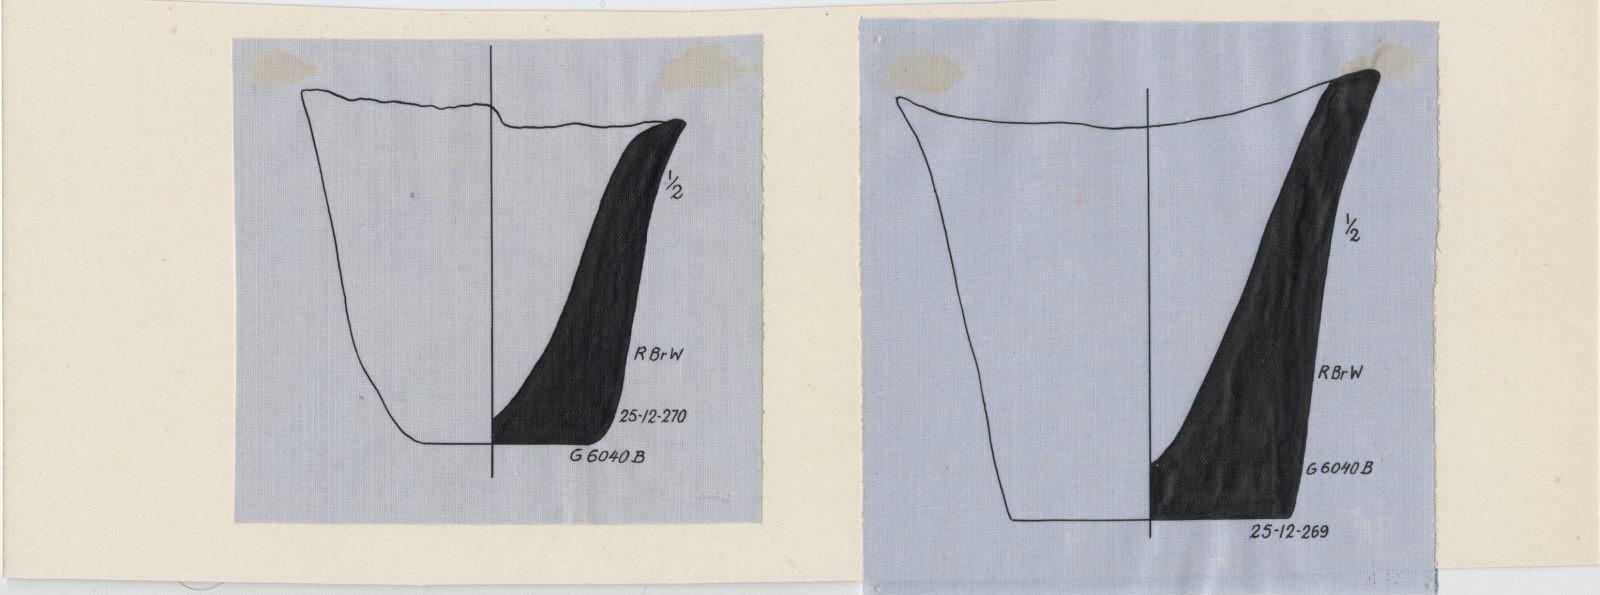 Drawings: G 6040, Shaft B: pottery, jar fragments